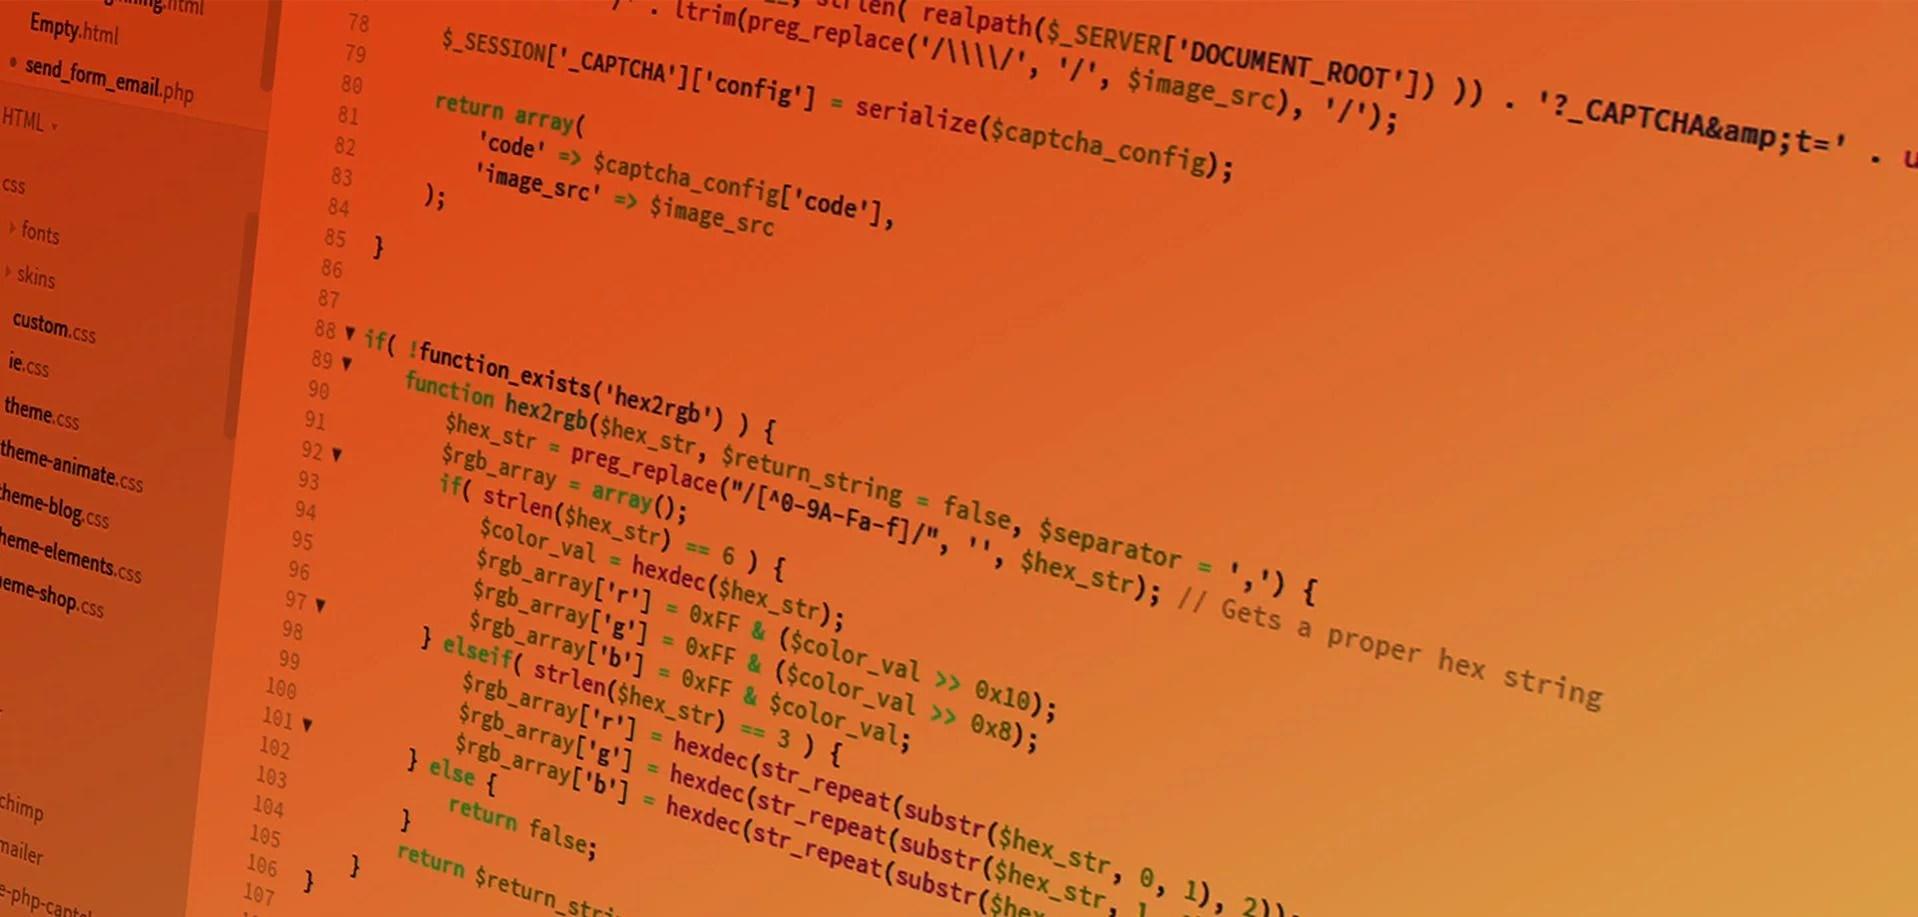 A computer screen displaying source code and debugging